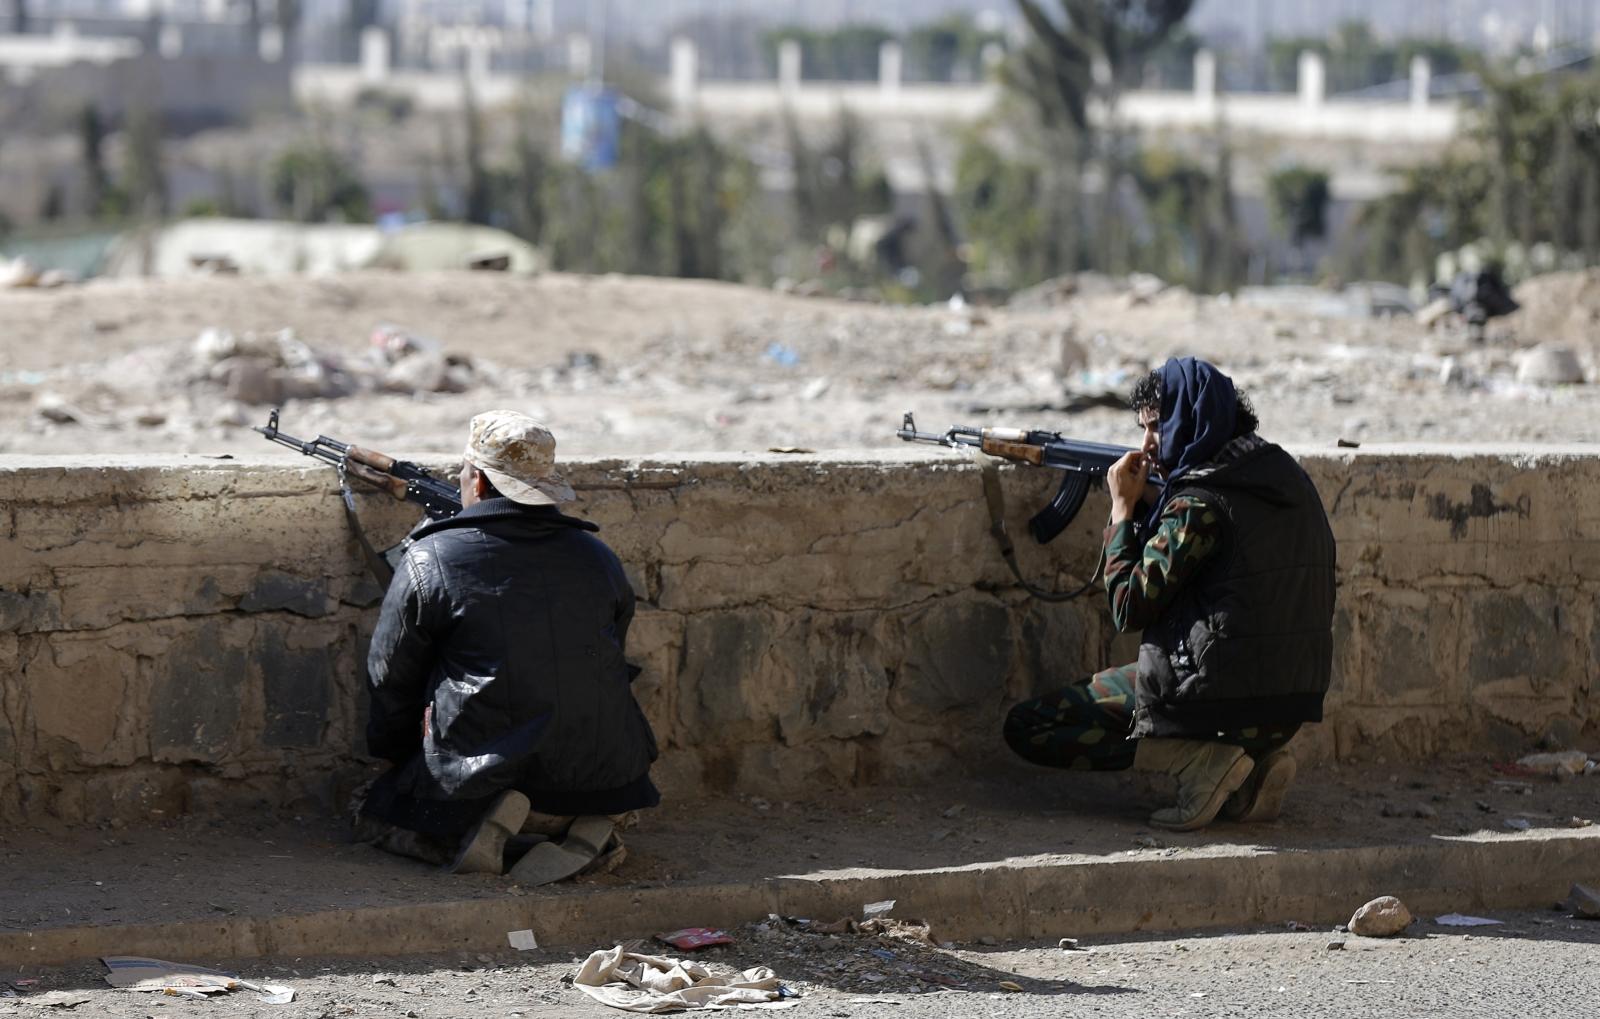 yemen-clashes.jpg?w=736&h=469&l=50&t=40